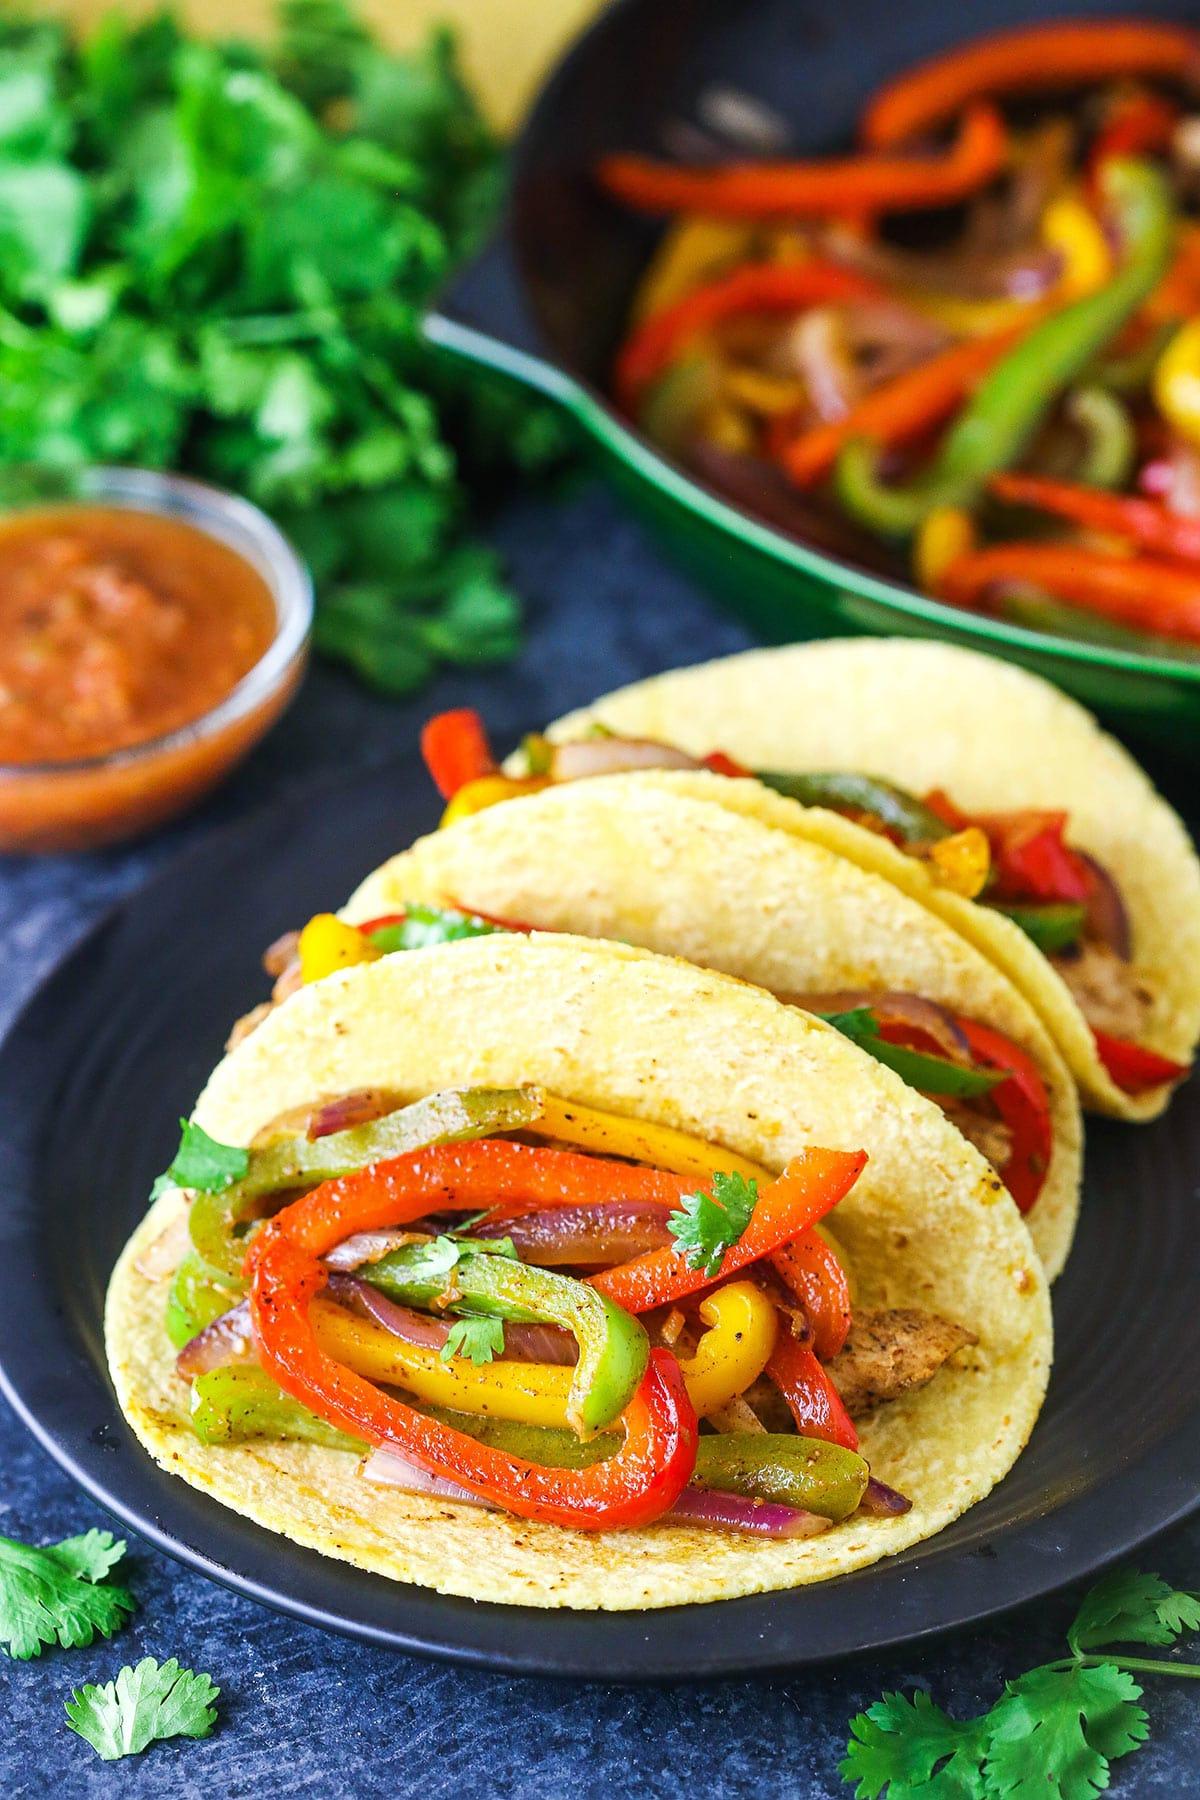 Vegetarian fajitas in a corn tortilla